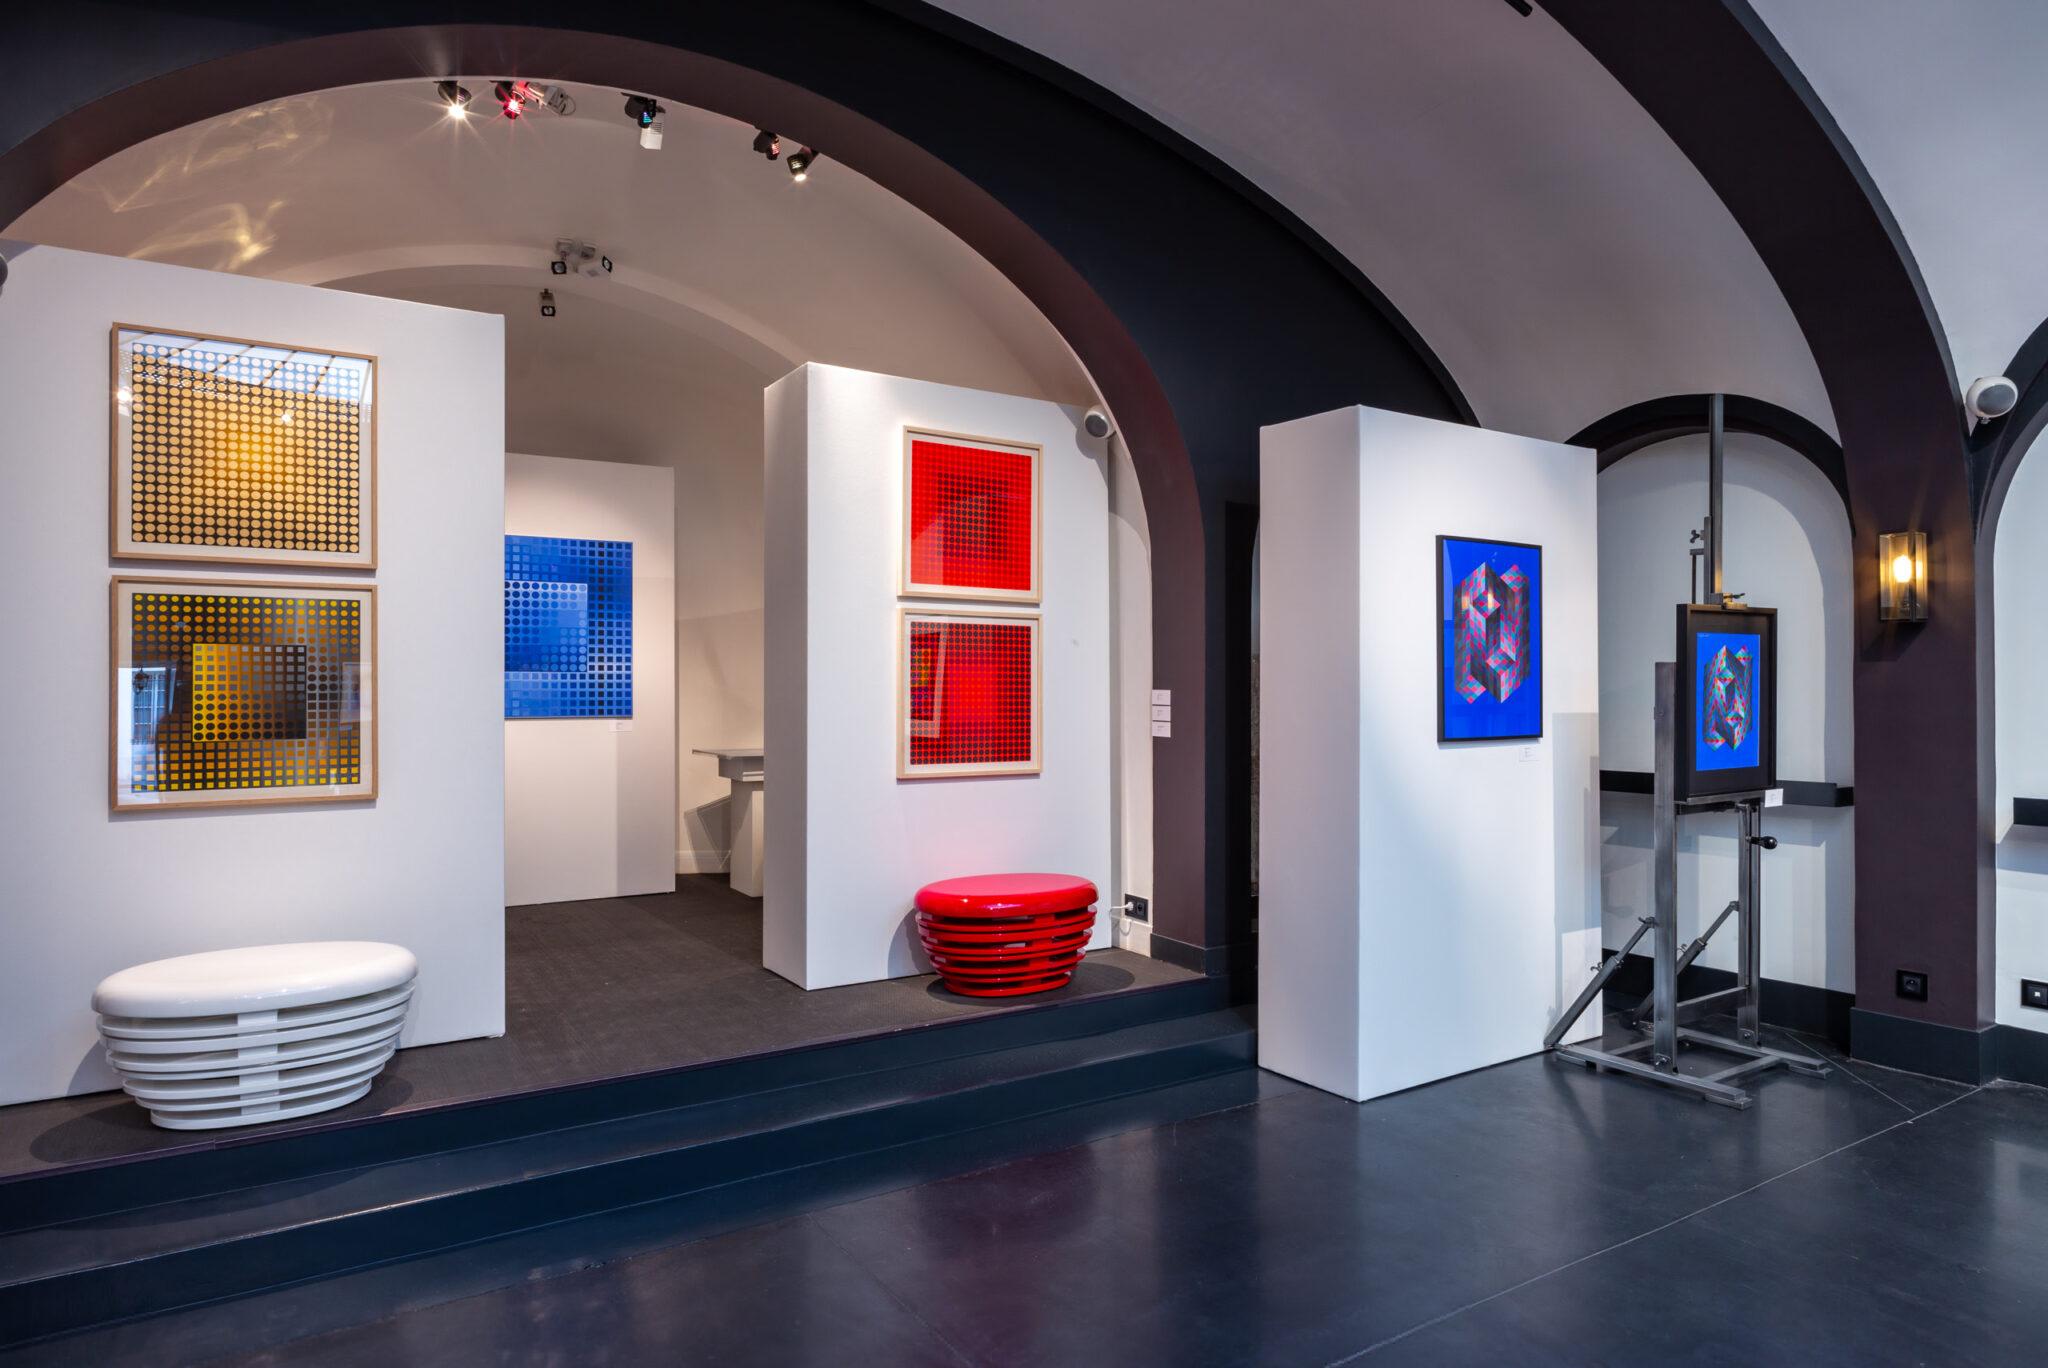 audrey-hatchikian-gallery-op-art-et-design-exposition-paris-art-contemporain